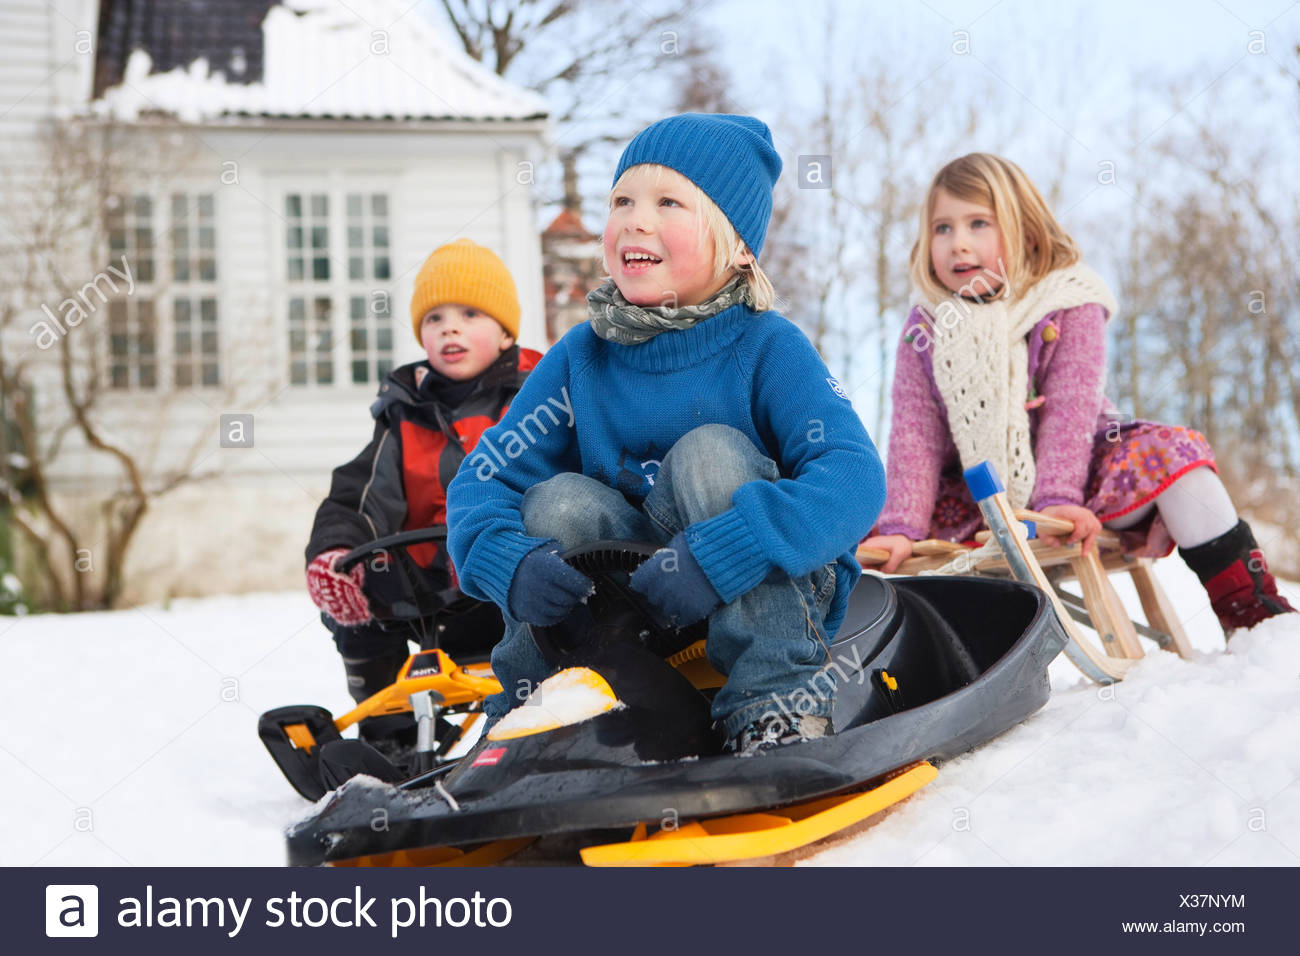 Skandinavische Kinder auf Schlitten Stockbild